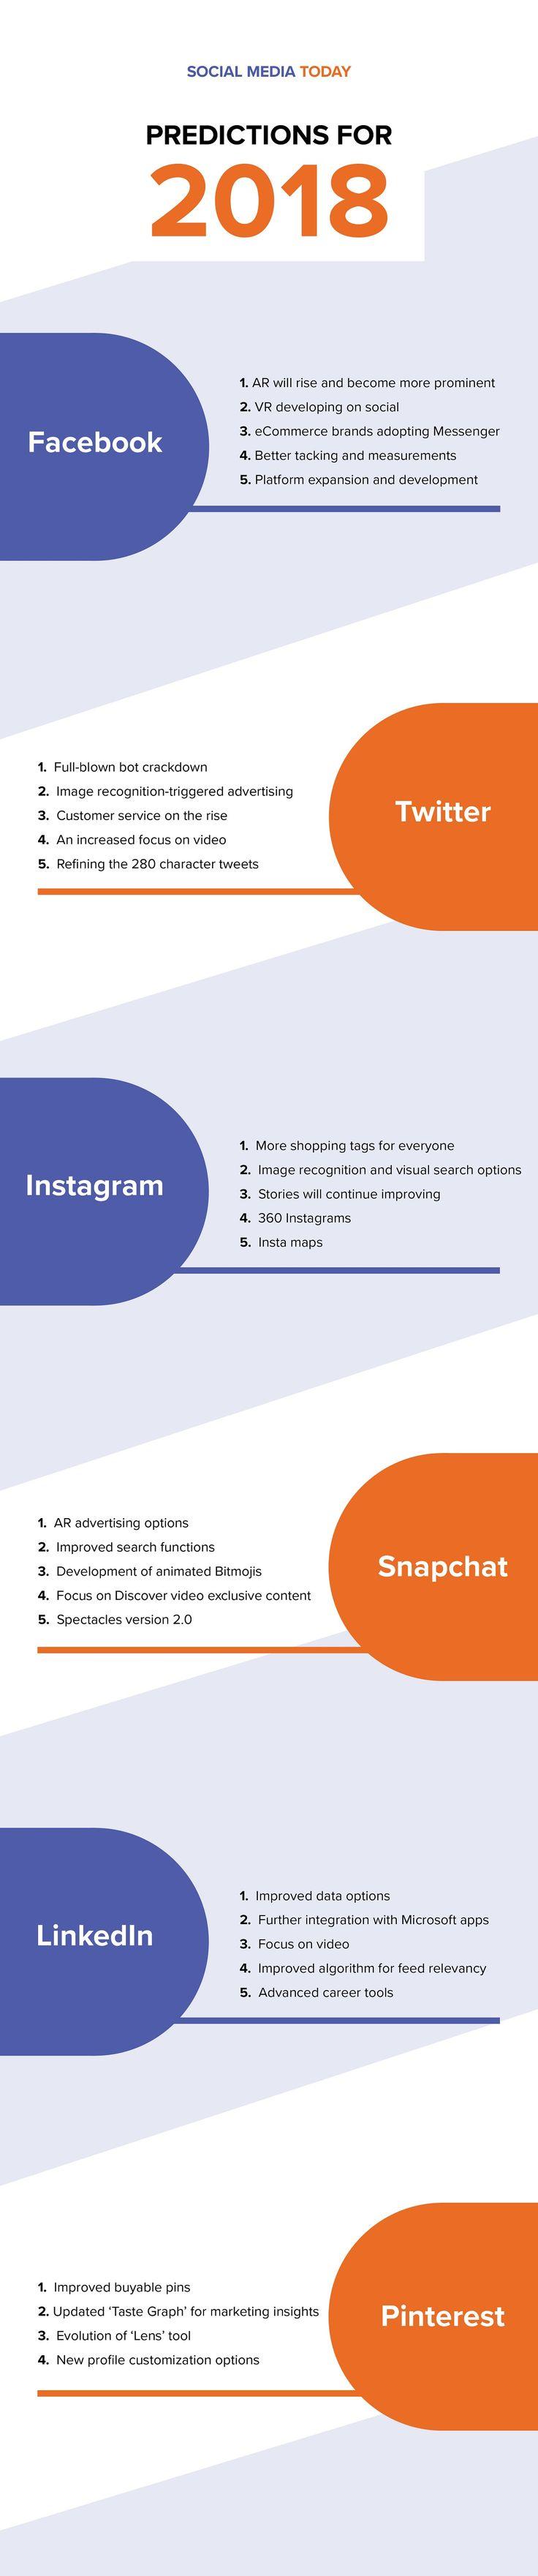 Social Media Today Predictions for 2018